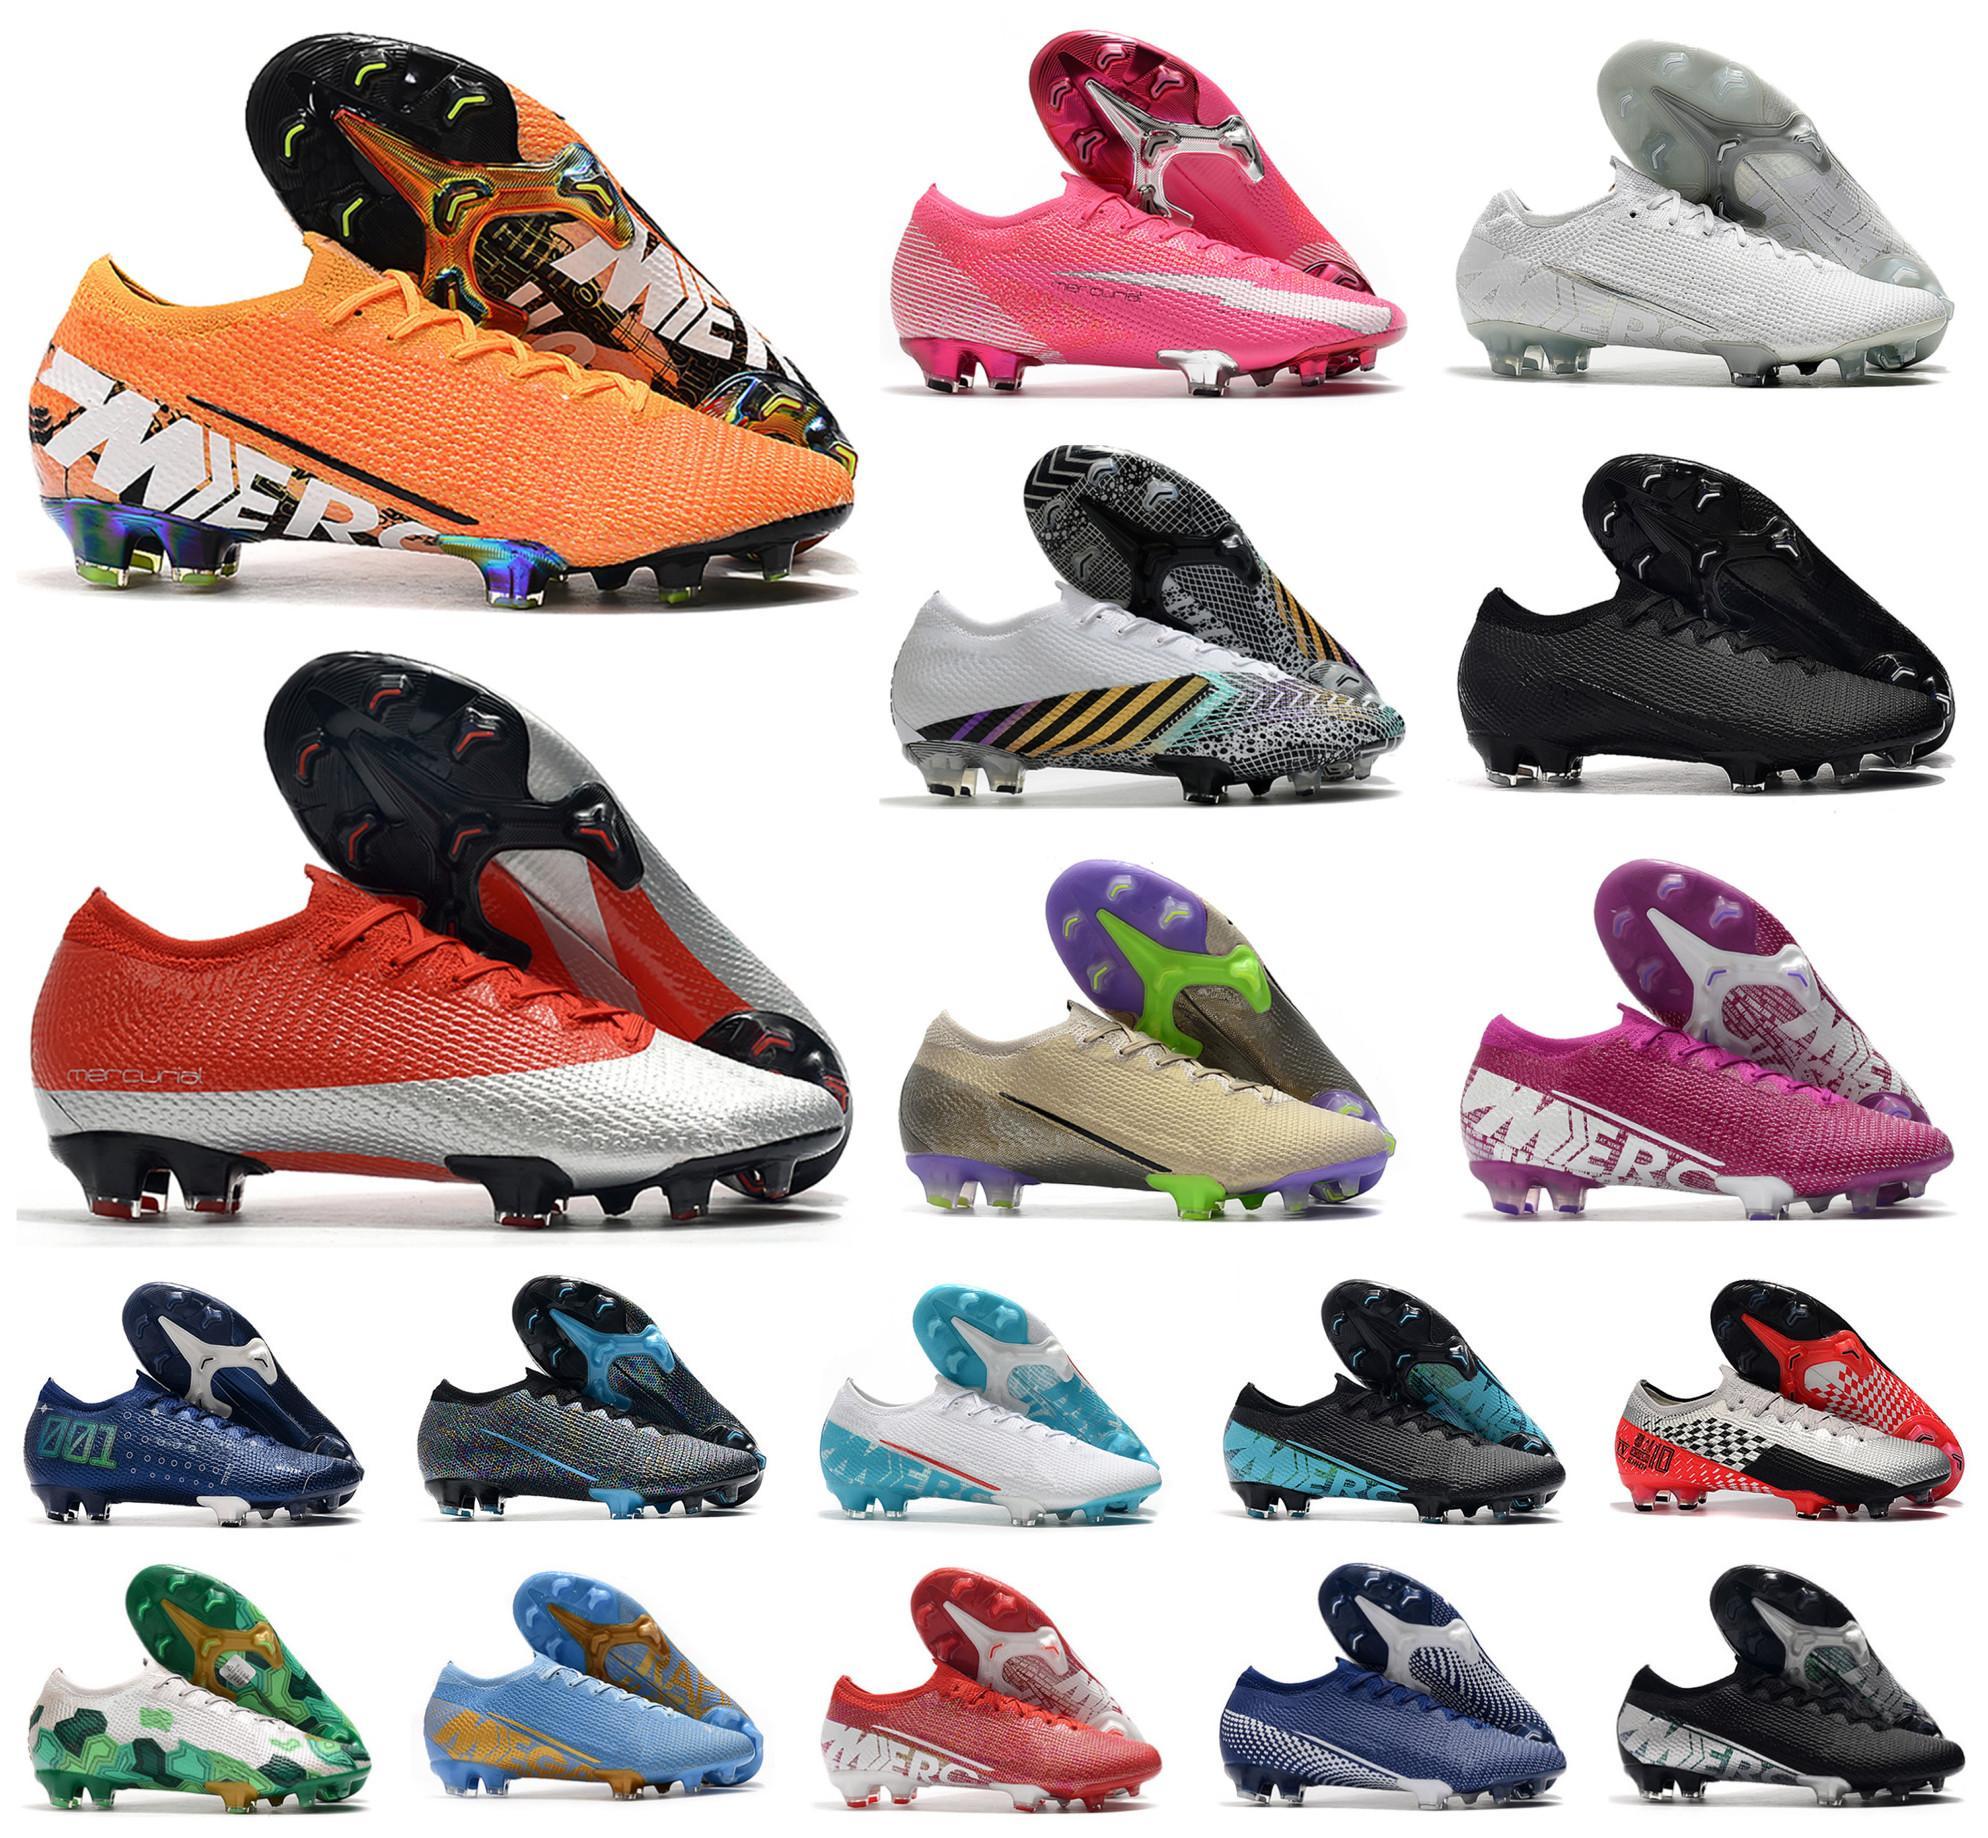 2021 رجال VA POR XIII Elite FG Low 13 Rosa Panther MDS 003 CR7 رونالدو 360 بنين كرة القدم أحذية كرة القدم أحذية US6.5-11